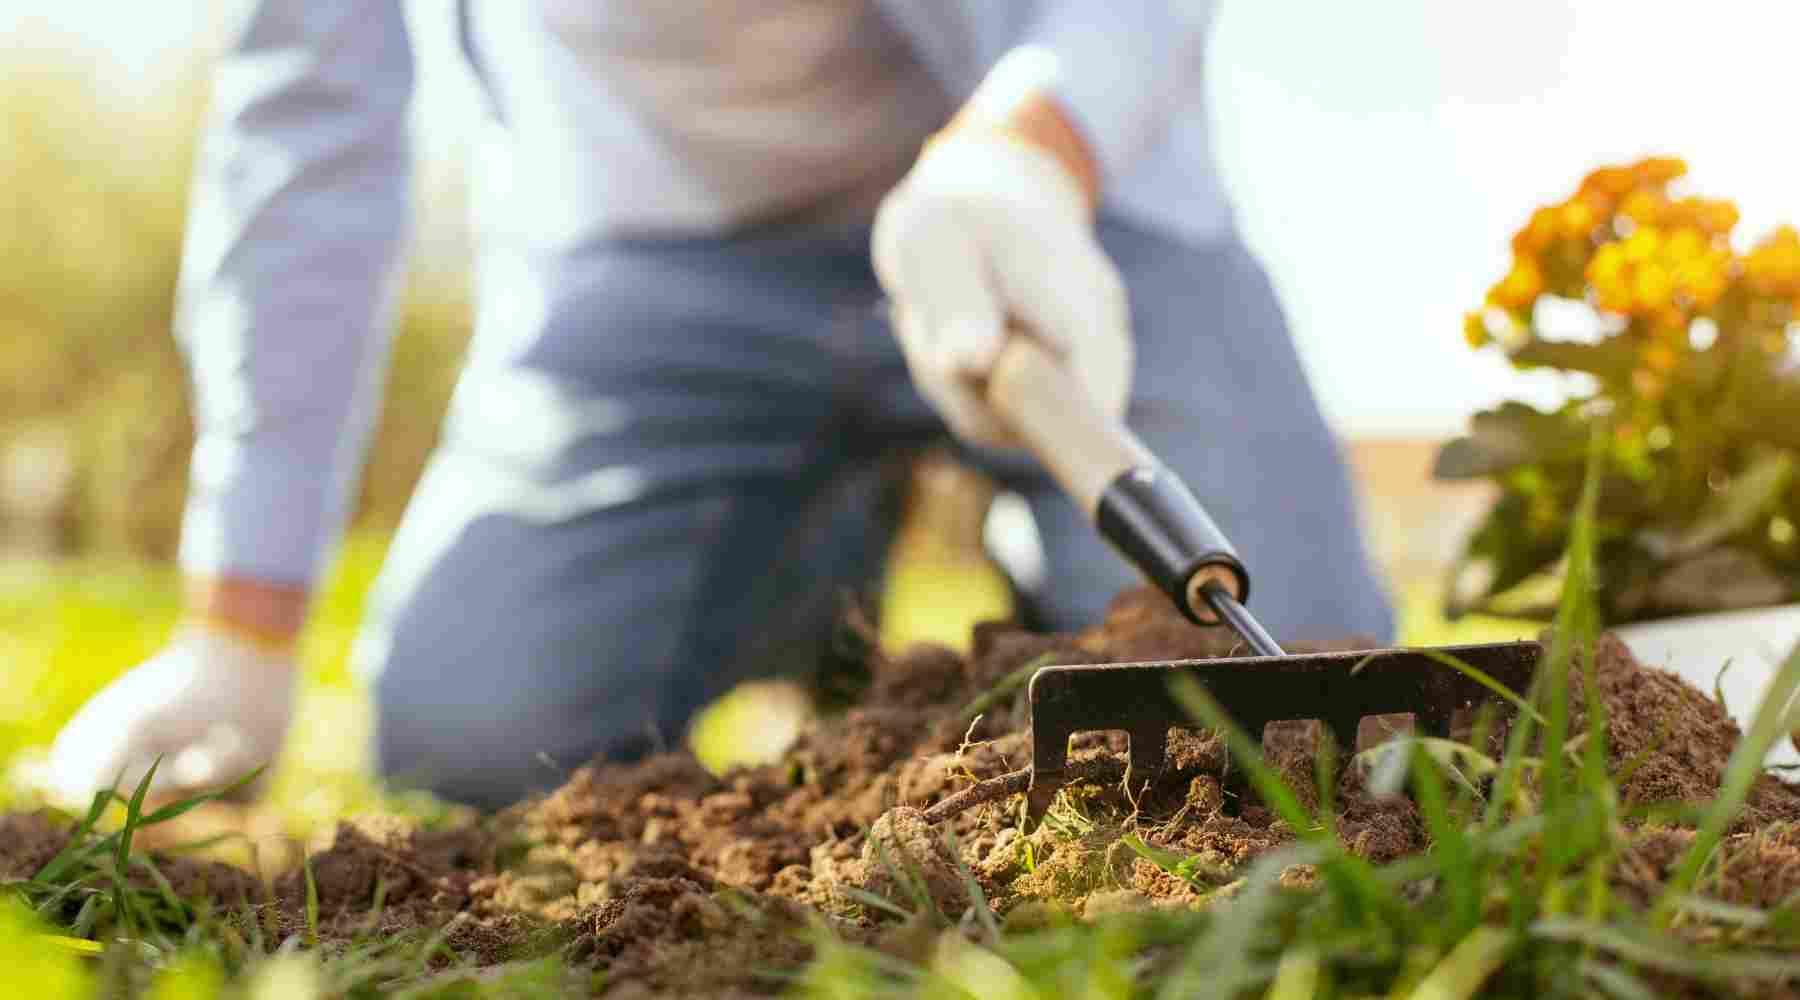 Hobbies that Make Money - Gardening